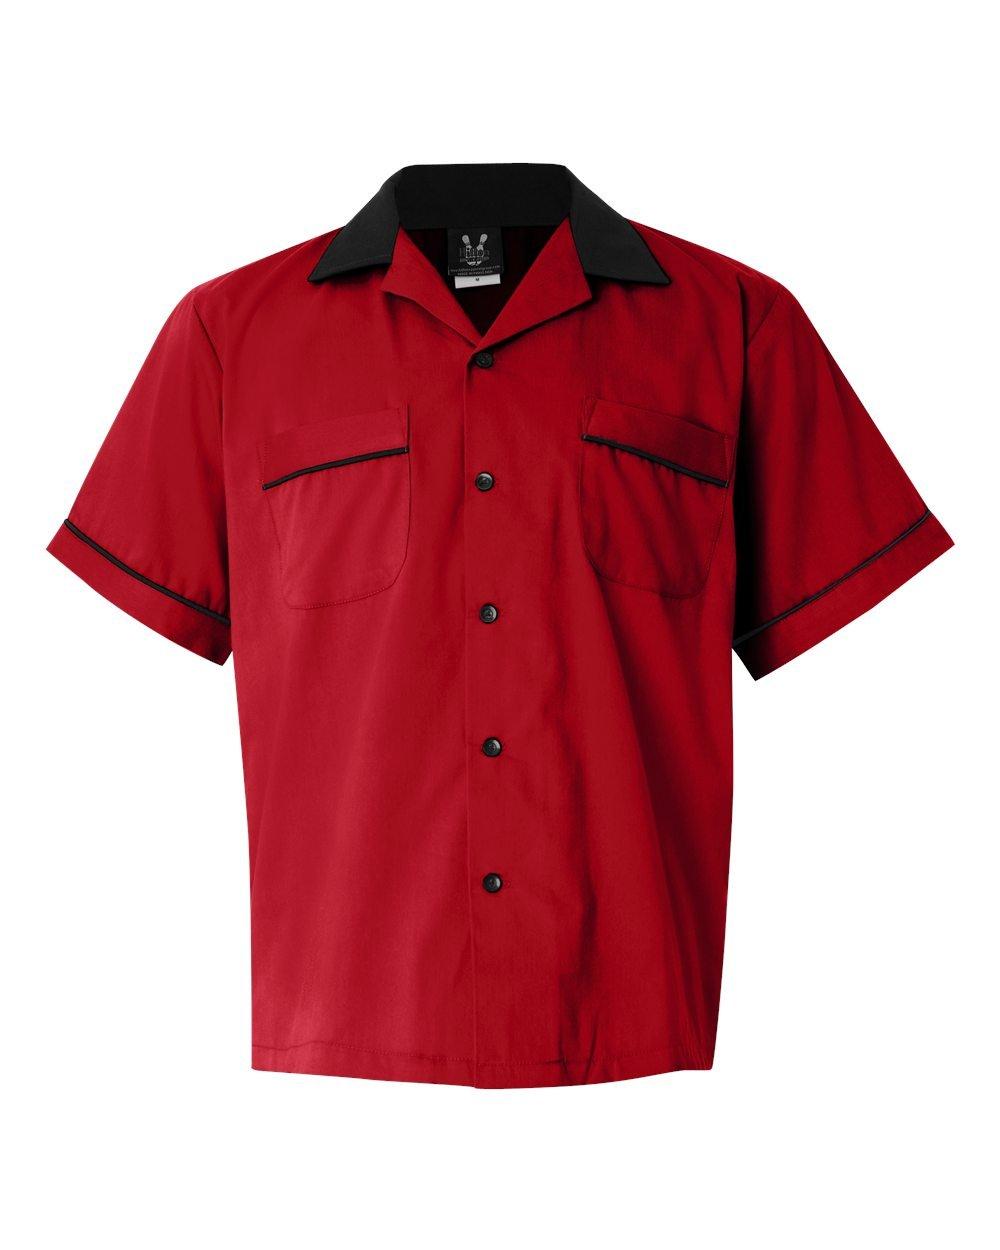 Hilton Mens Bowling Retro Gm Legend, Red/Black, Small